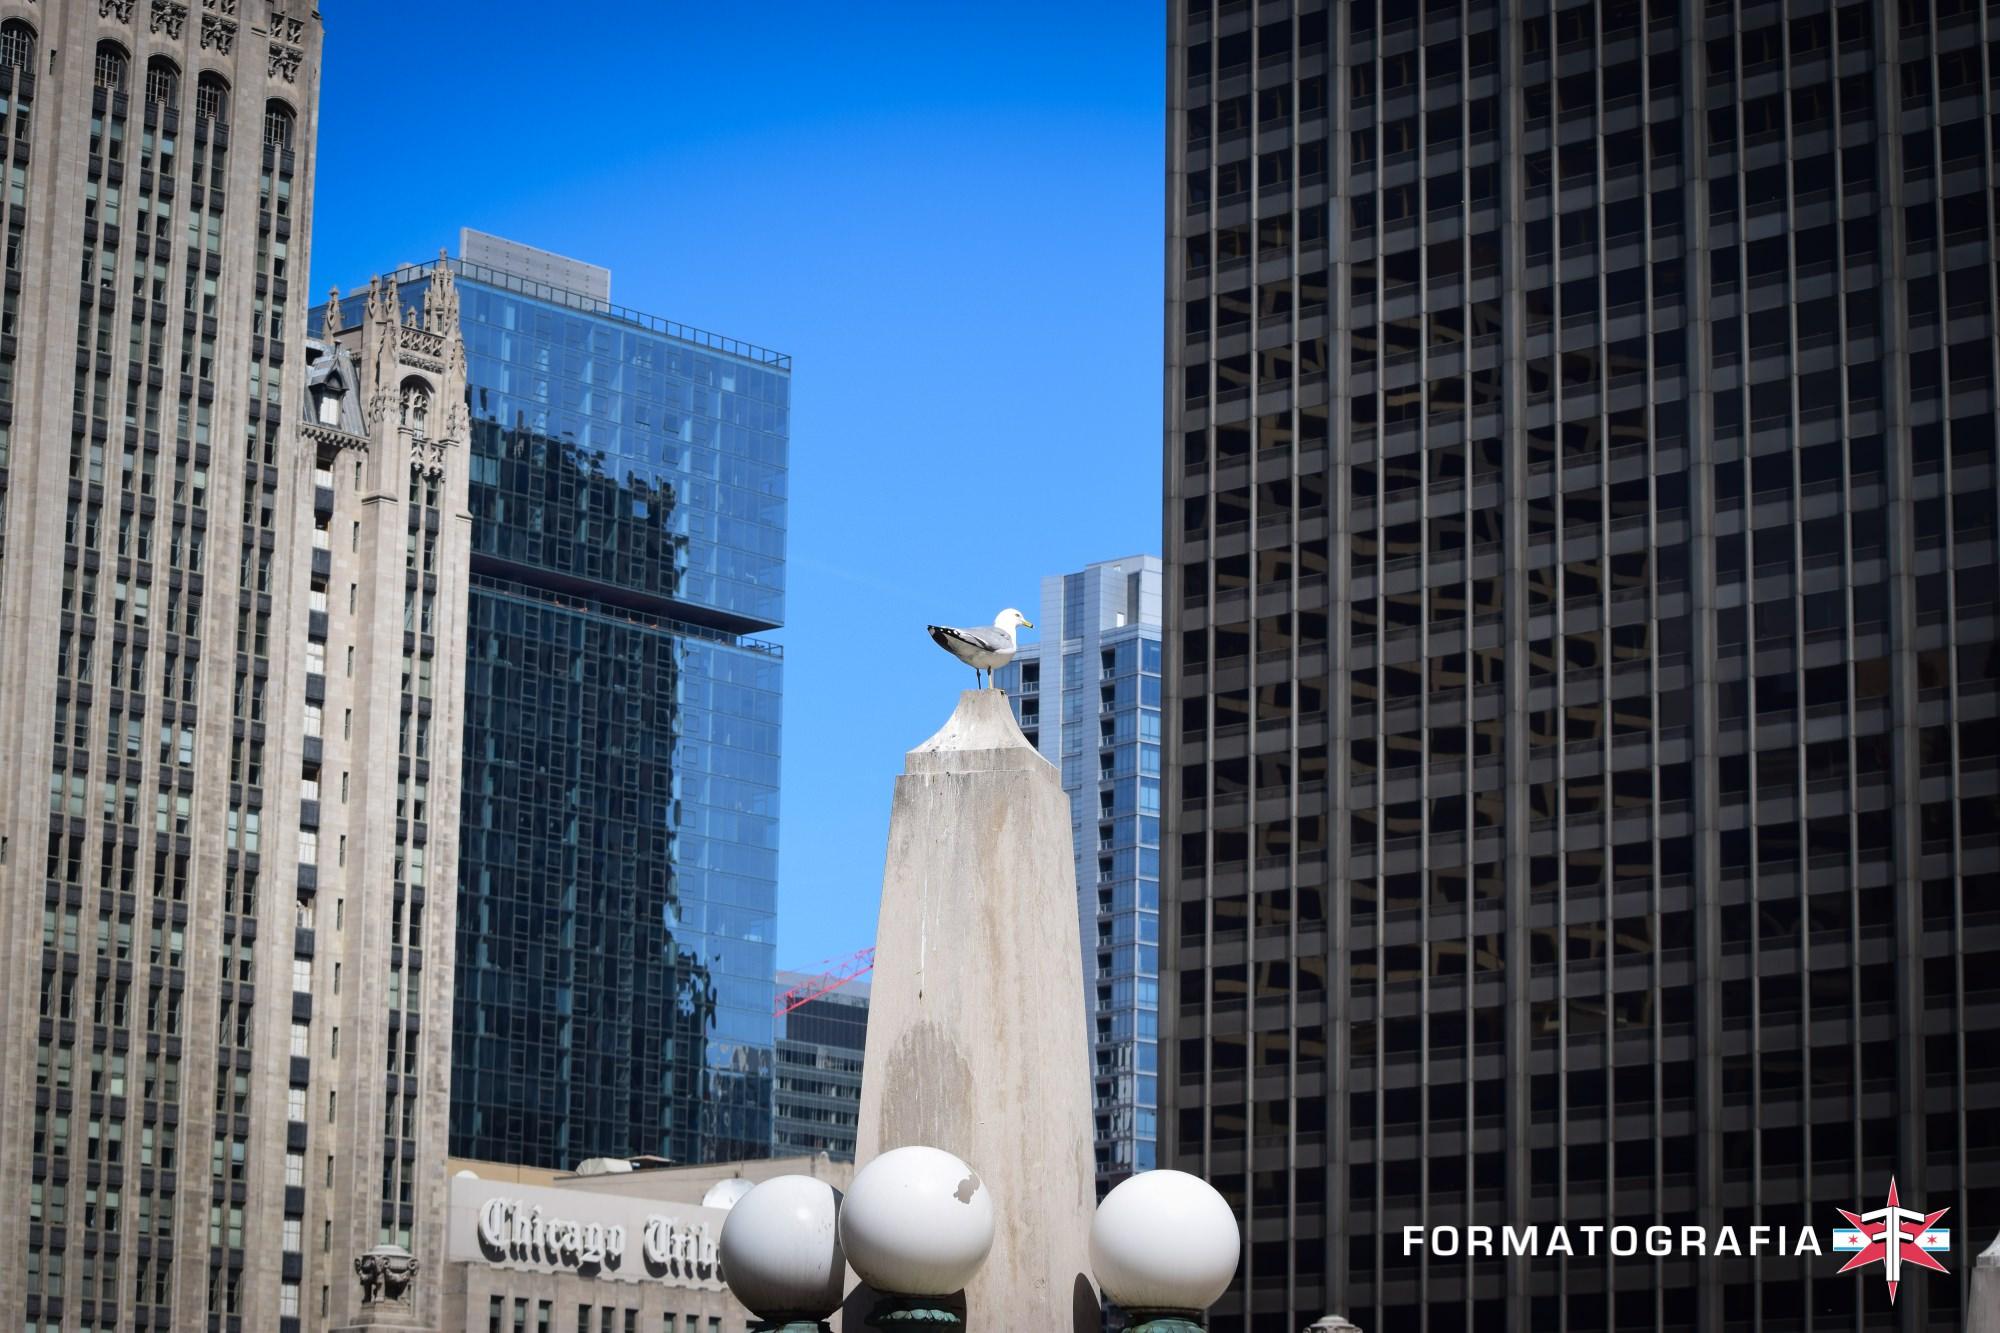 eric formato chicago photographer fall update city architecture shotsDSC_0617.jpg